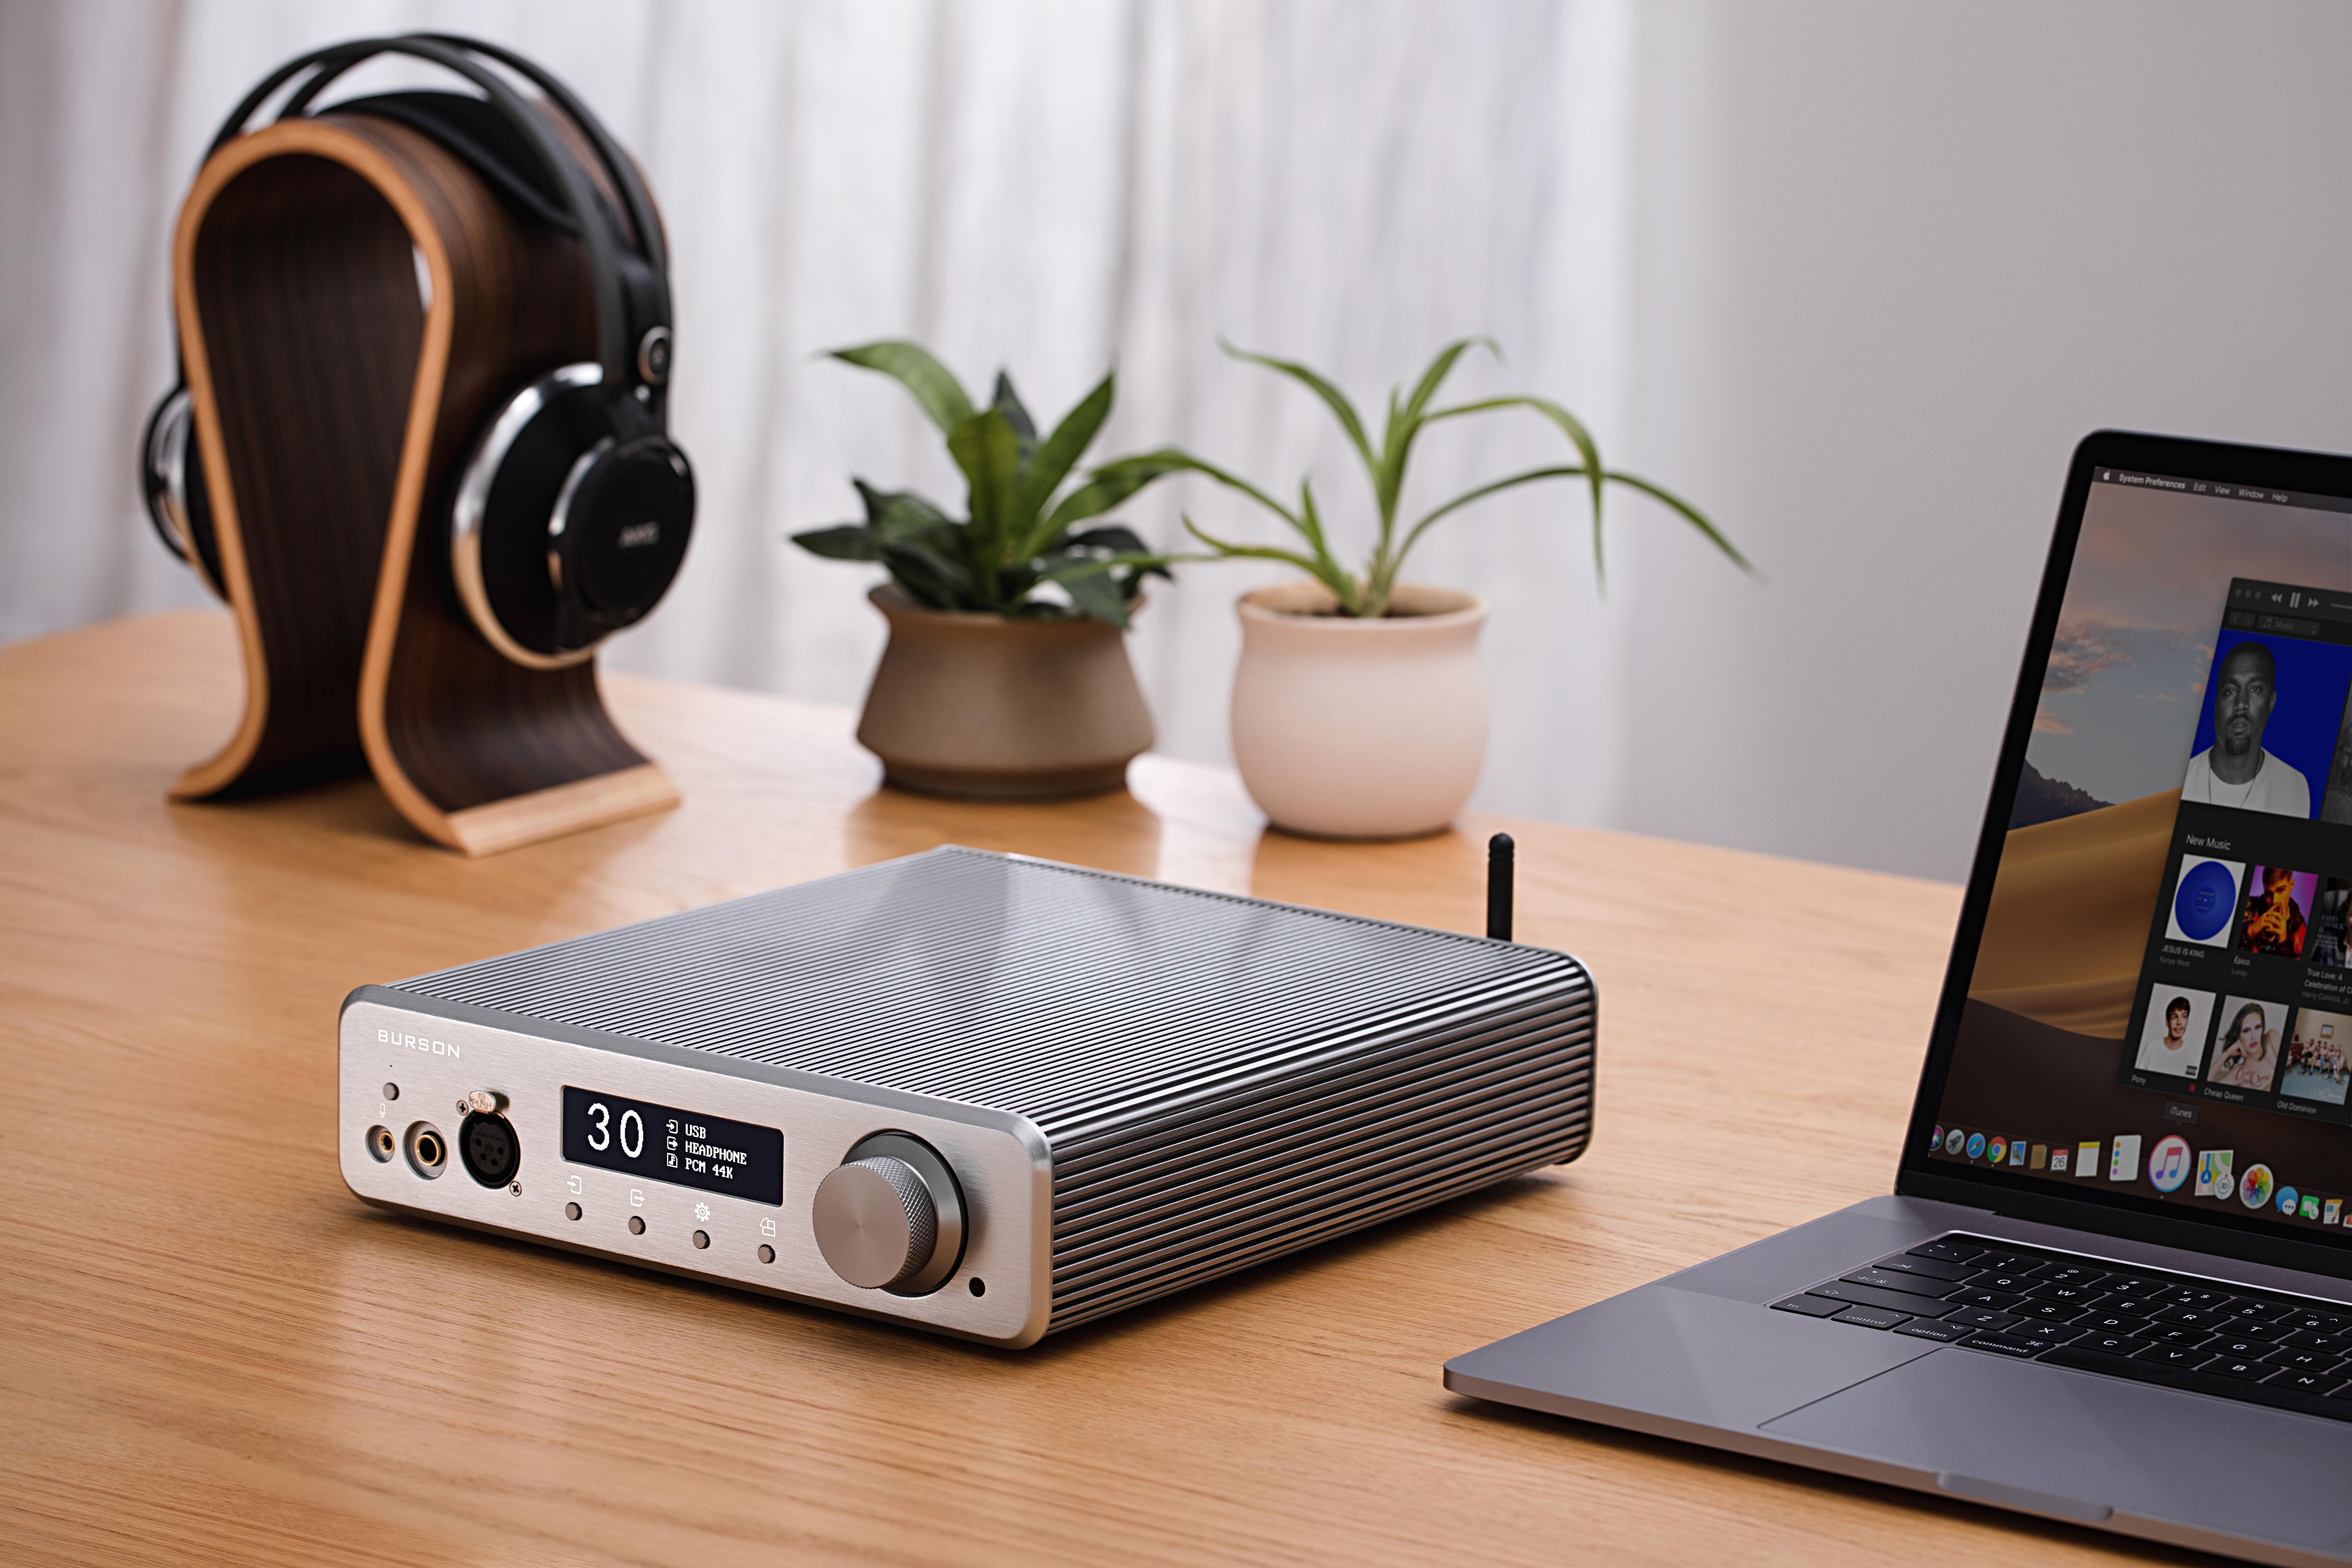 burson-audio-conductor-3x-reference-lifestyle1-headamp-preamp-dac.jpg